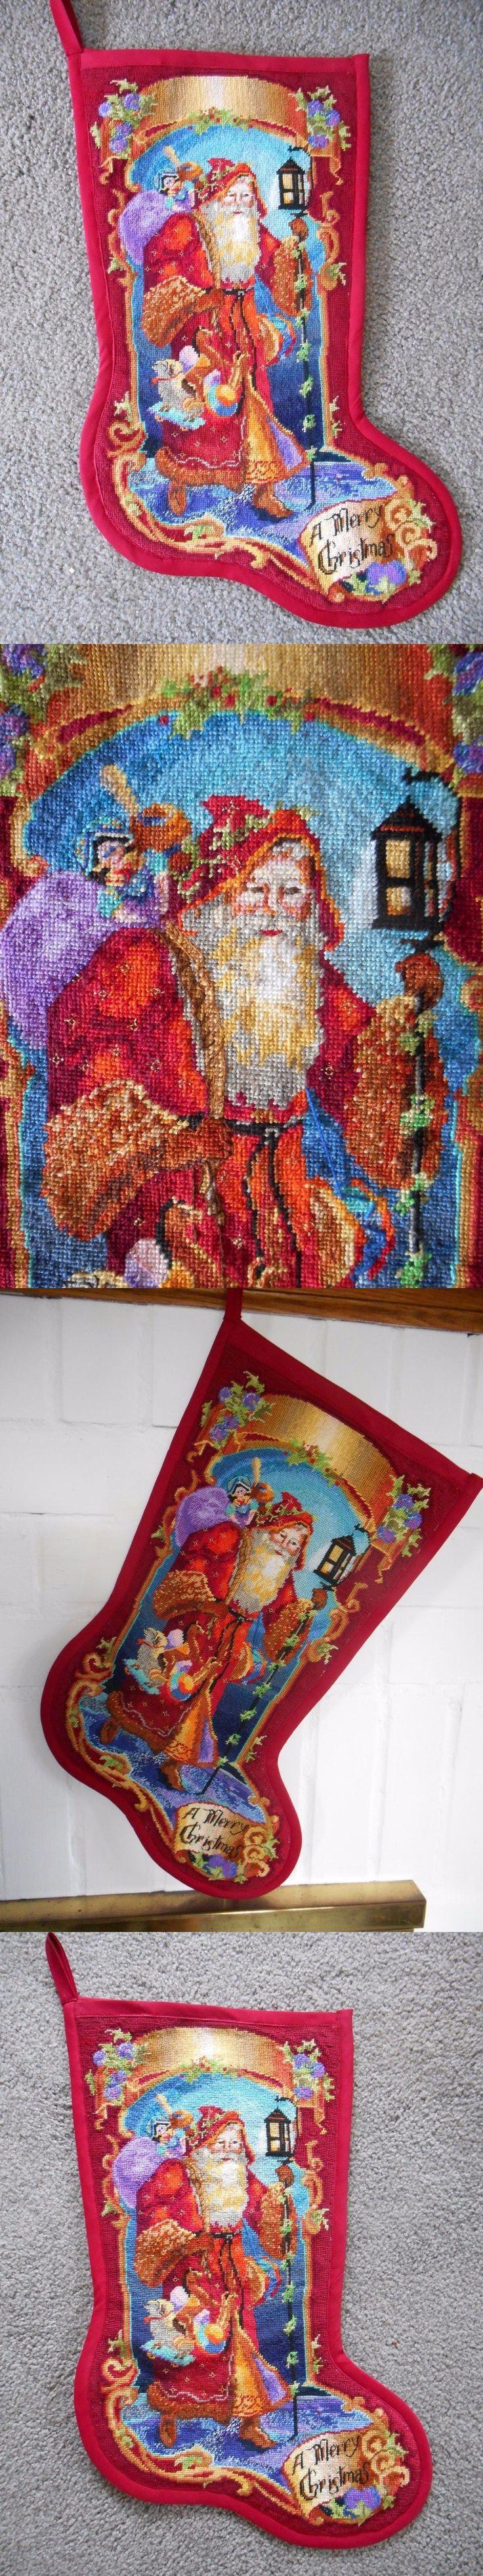 Finished Needlepoint Pieces 83946: New Finished Bucilla Father Christmas Needlepoint Stocking Rossi Santa 60769 -> BUY IT NOW ONLY: $499.99 on eBay!